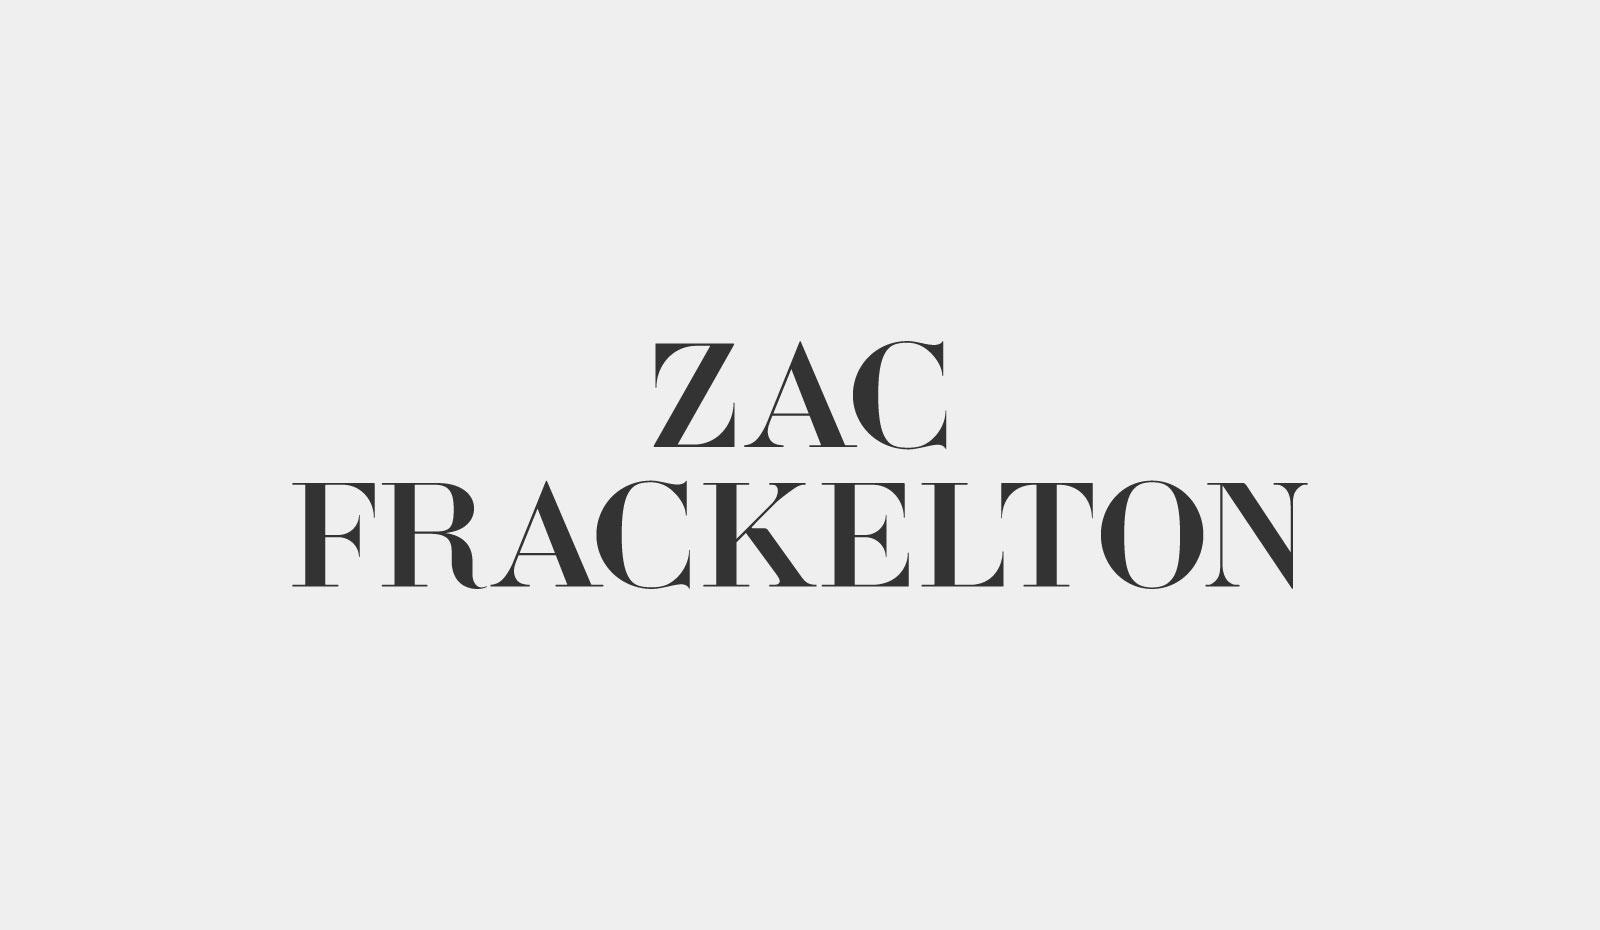 Zac Frackelton